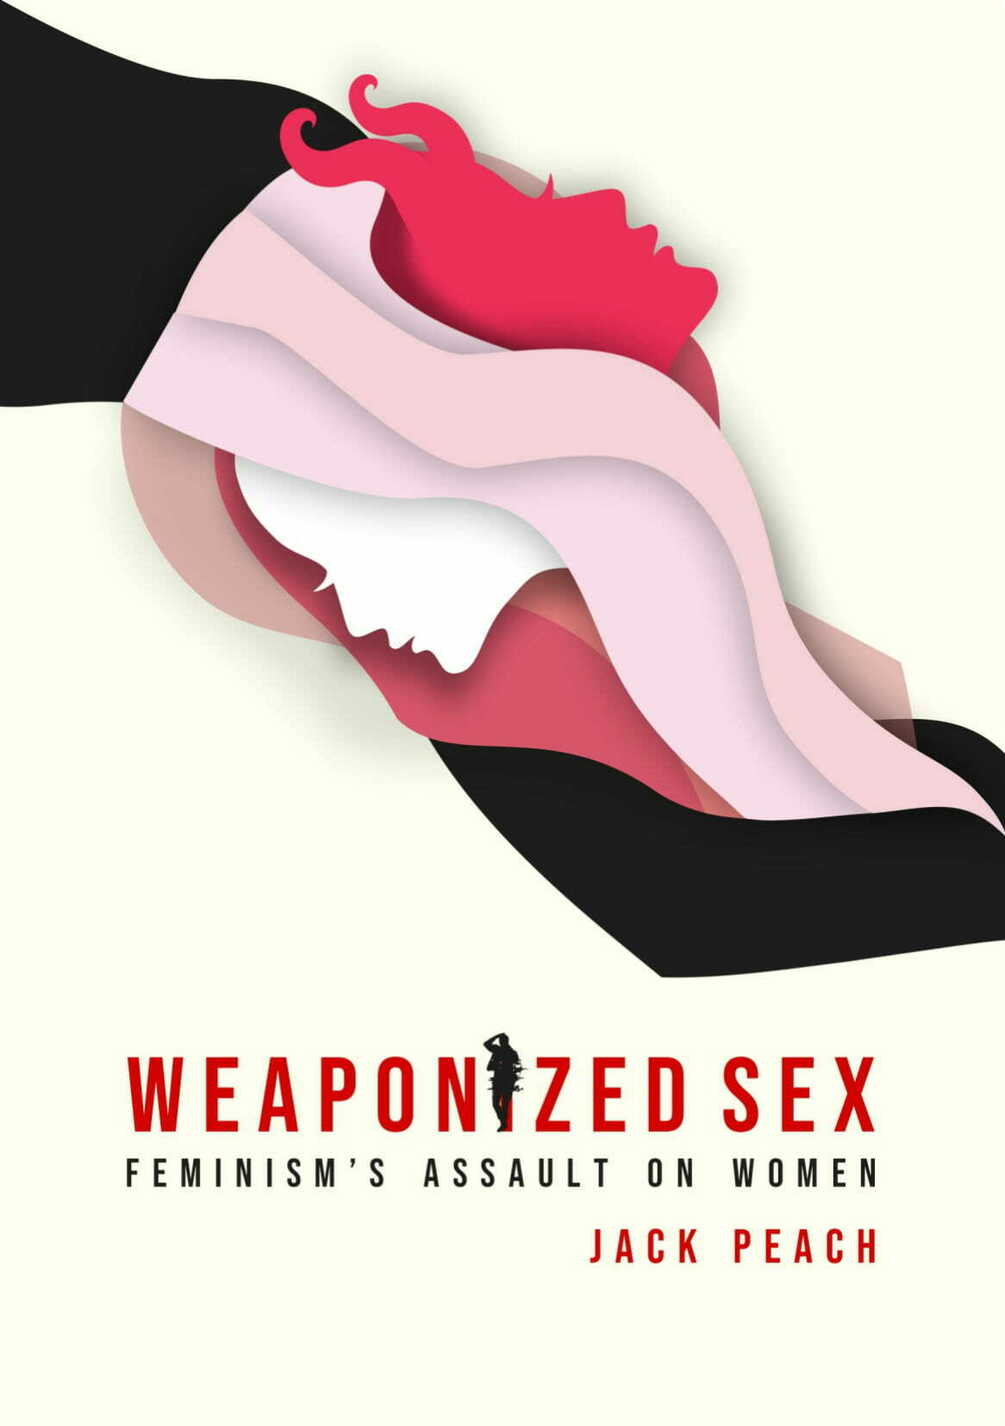 Weaponized sex feminisms assault on women book cover